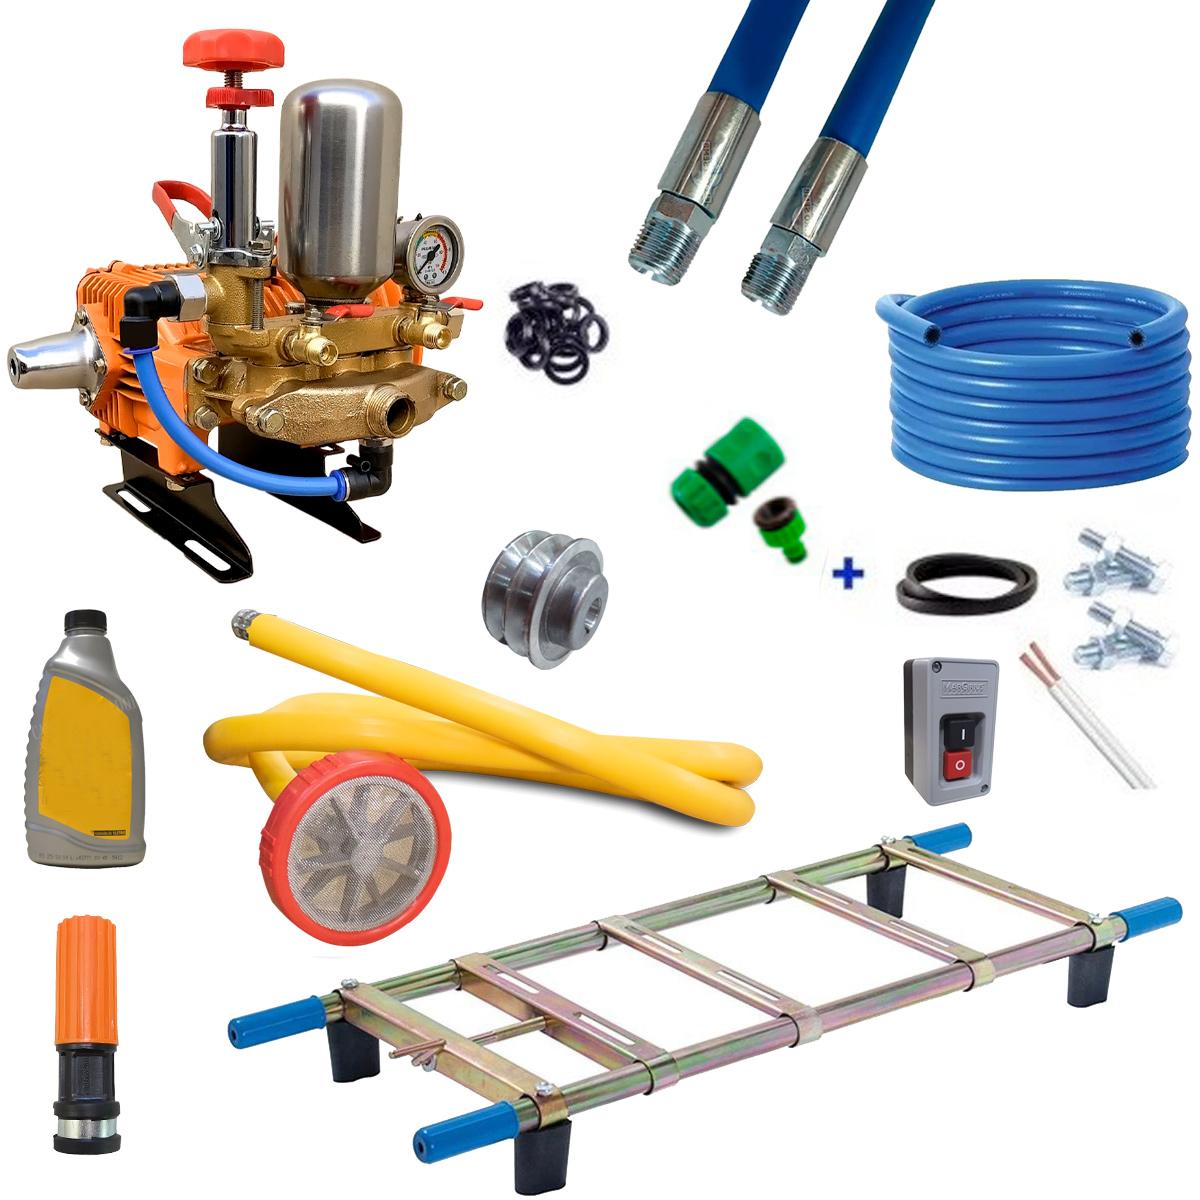 Lavadora Profissional Alta Pressão Lava Jato 3 Pistões 22L Mangueira 20M S/ Motor